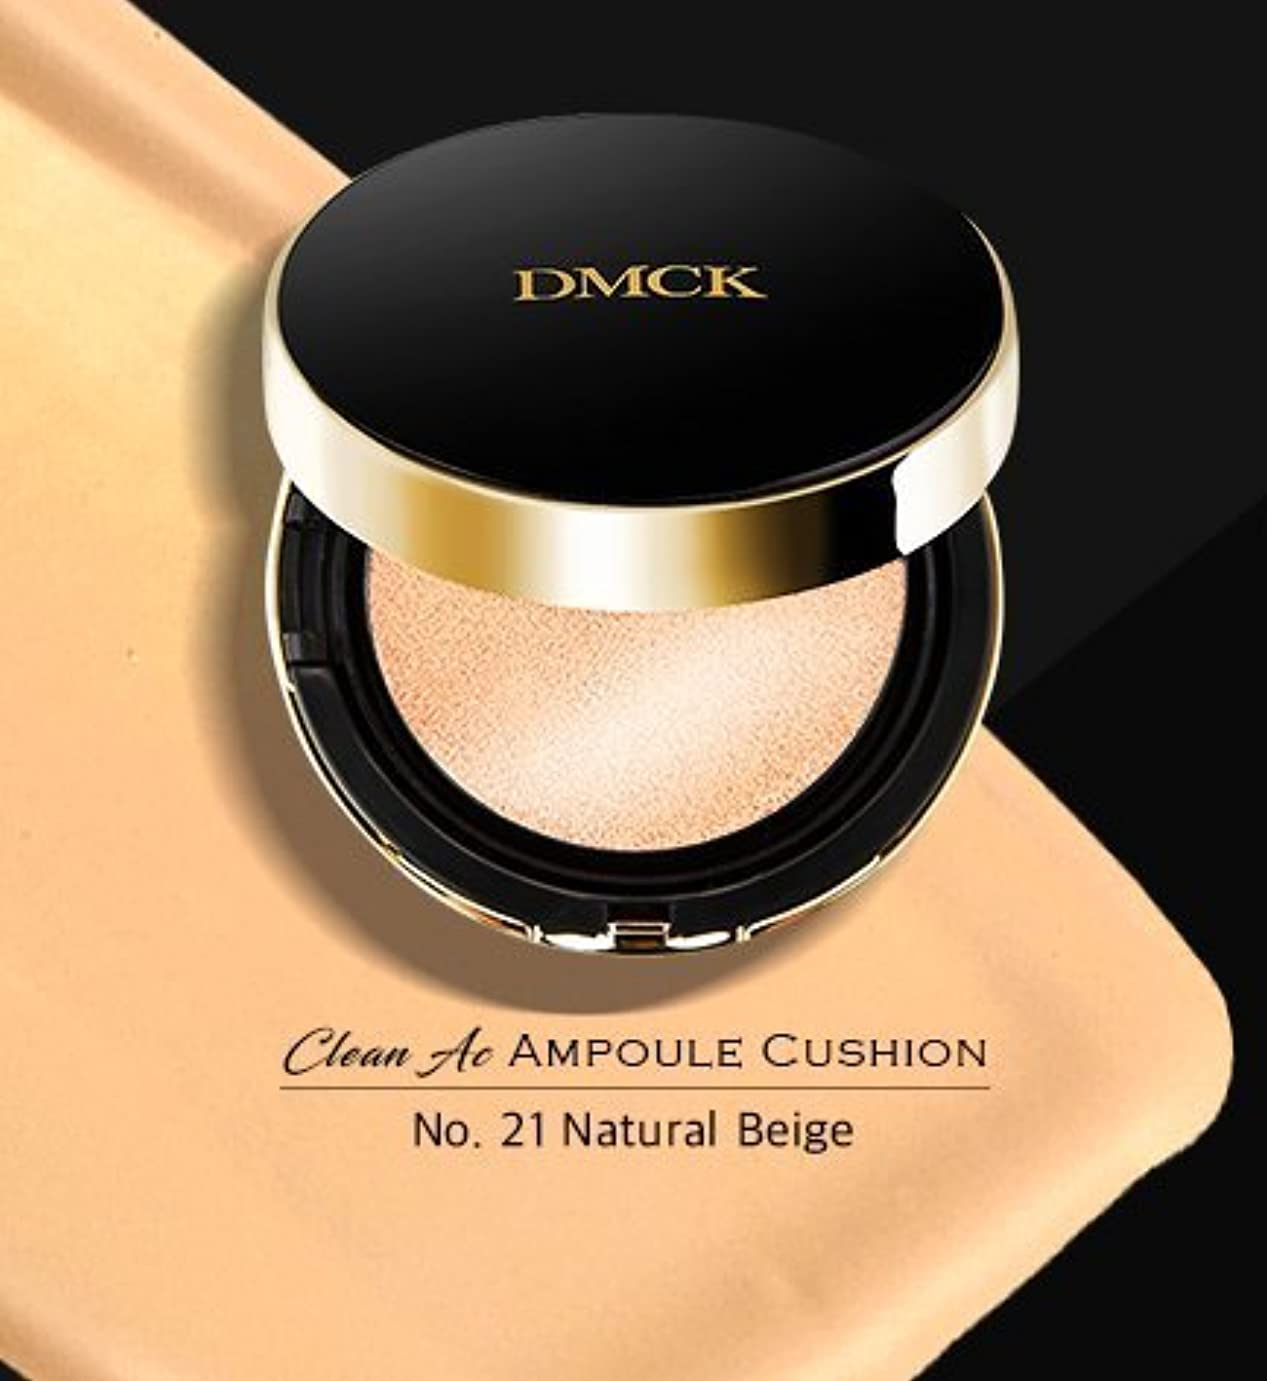 DMCK Clean Acne Ampule Cushion SPF50+/PA+++ (021 Glossy Natural Beige)